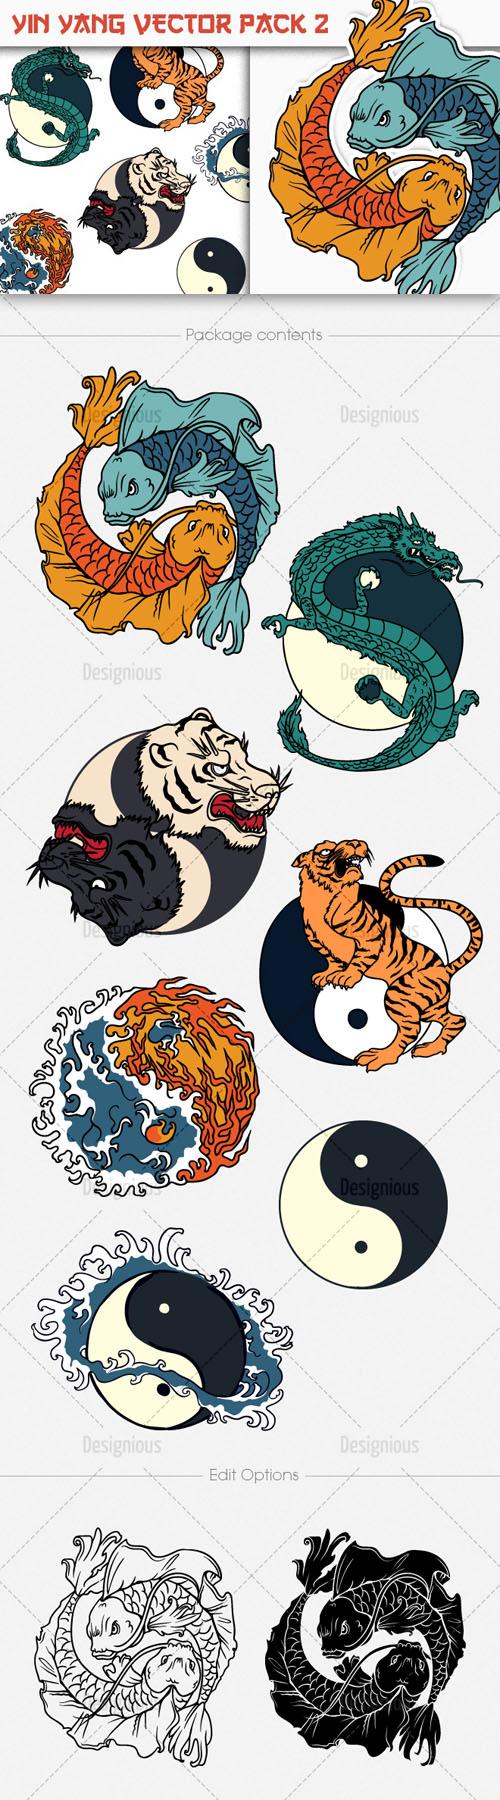 Shirt design vector pack - Yin Yang Photoshop Vector Pack 2